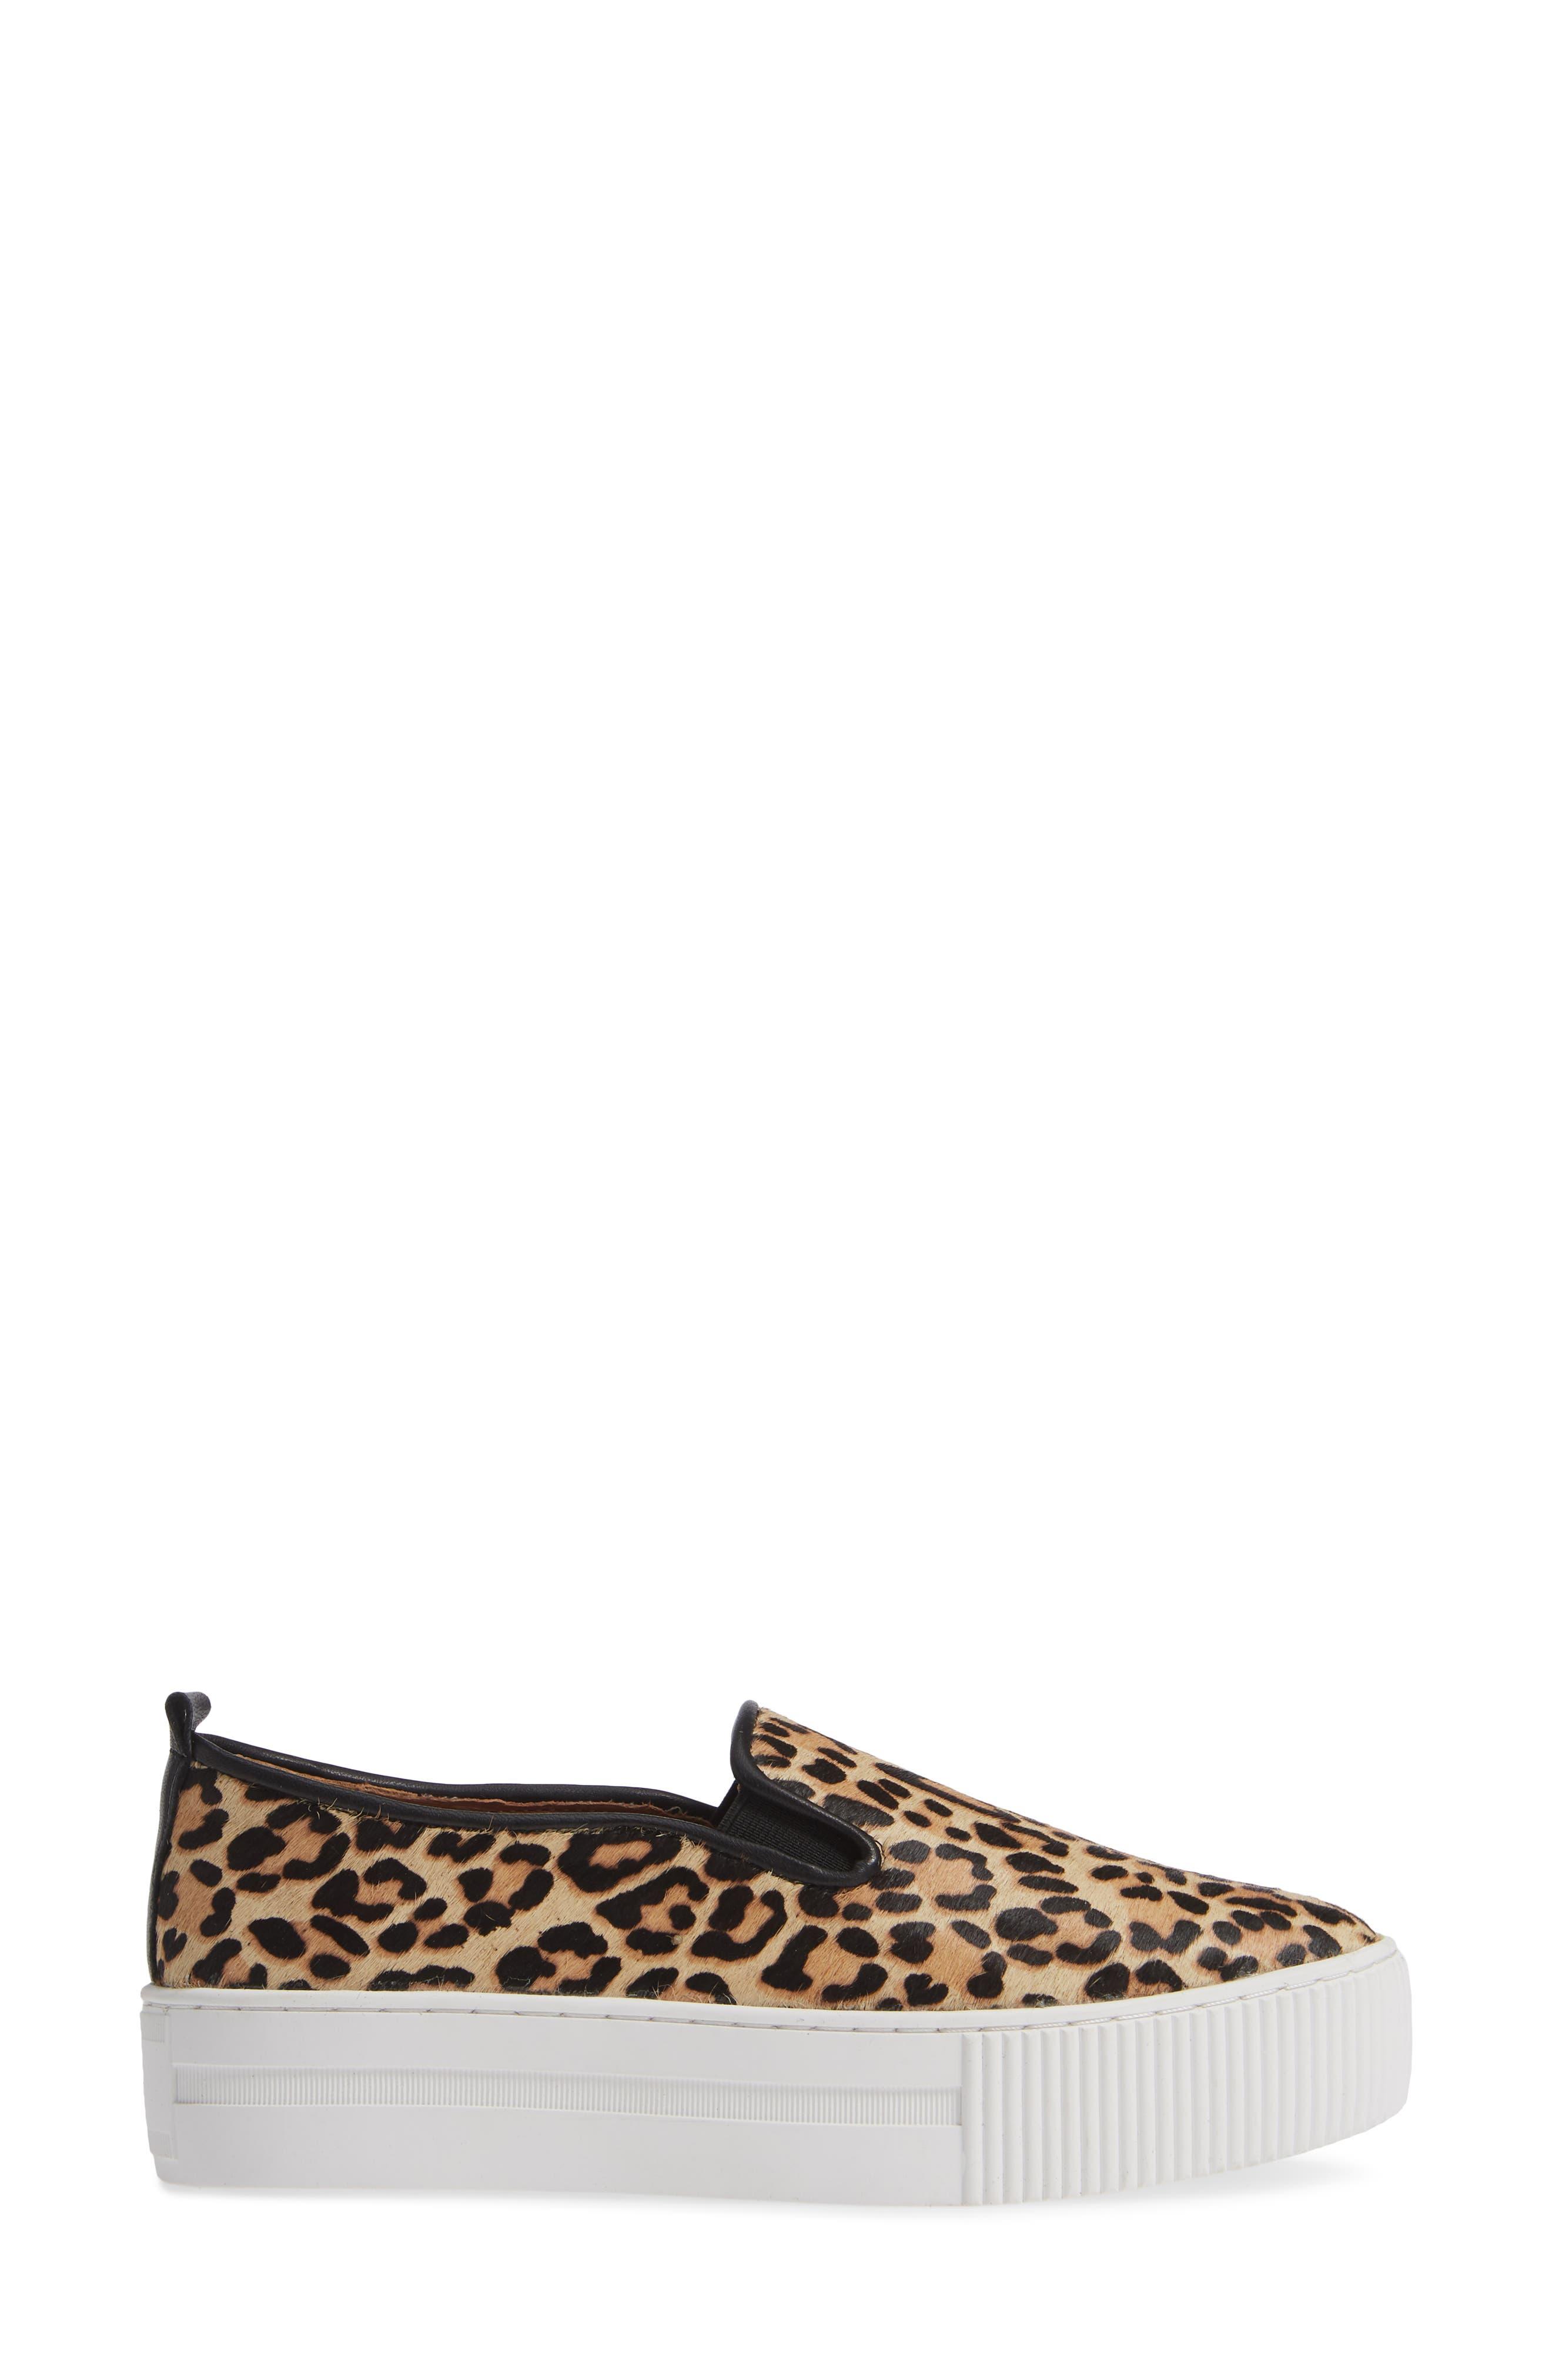 Baylee Platform Slip-On Sneaker,                             Alternate thumbnail 3, color,                             LEOPARD HAIRCALF